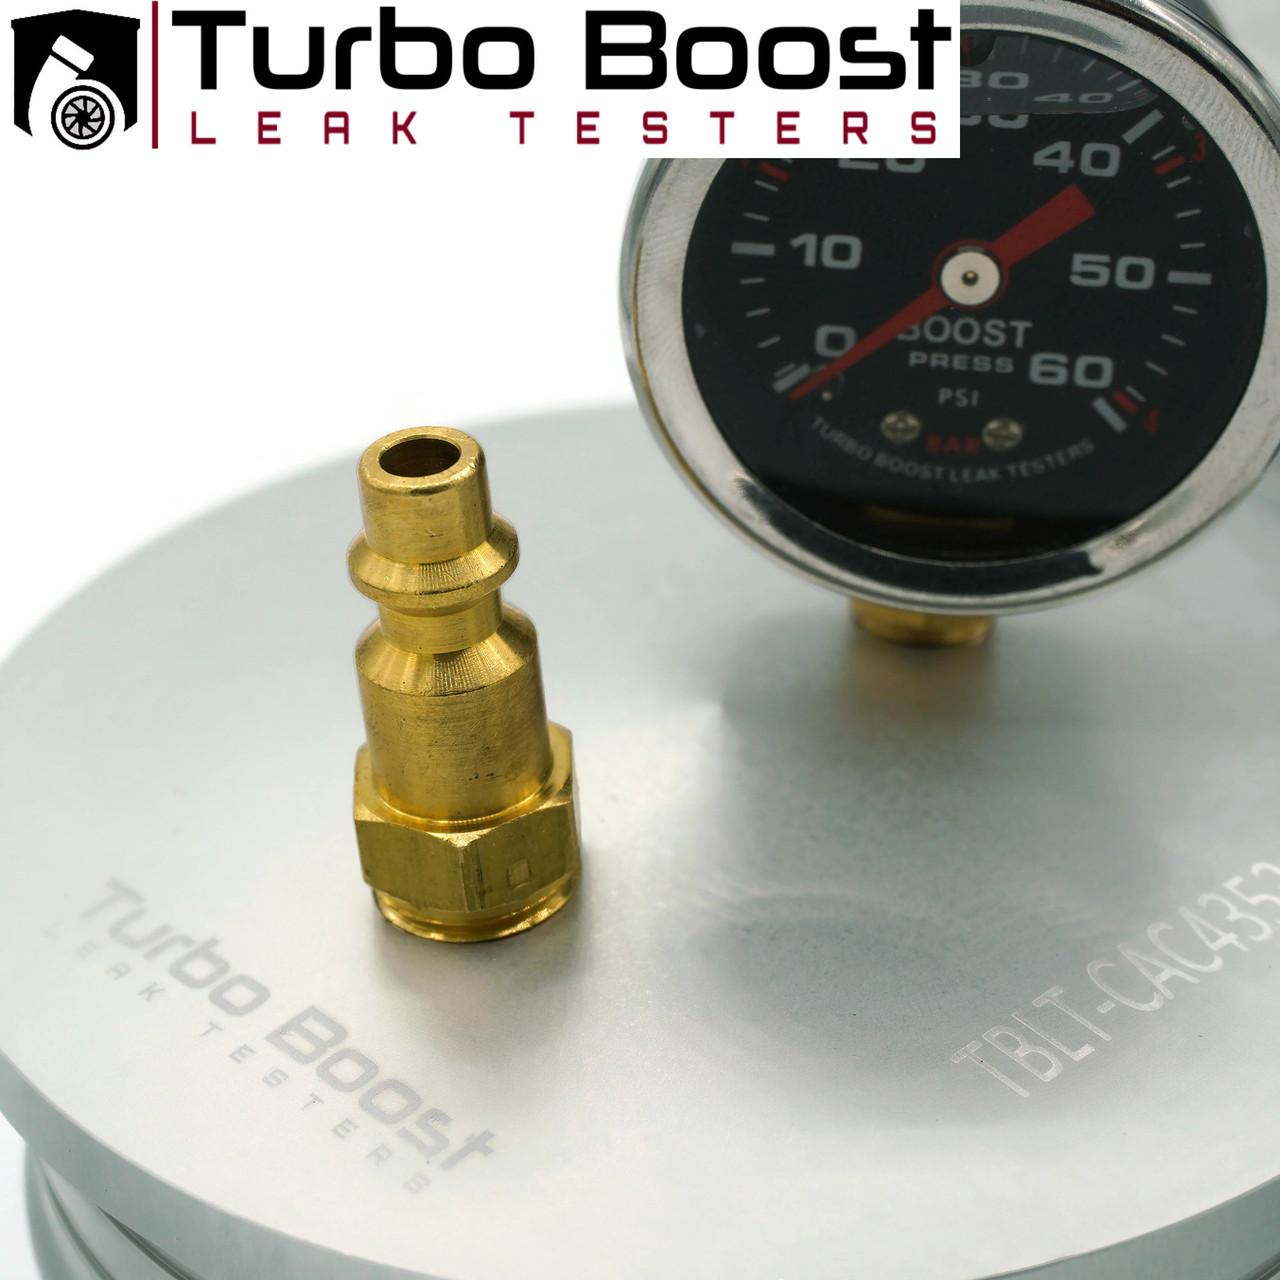 "Charge Air Cooler CAC Boost Leak Tester -  6061 BILLET ALUM 60 PSI - Class 7 & 8 Trucks - Fits into intercooler hose 4"", 3.5"", 3"""